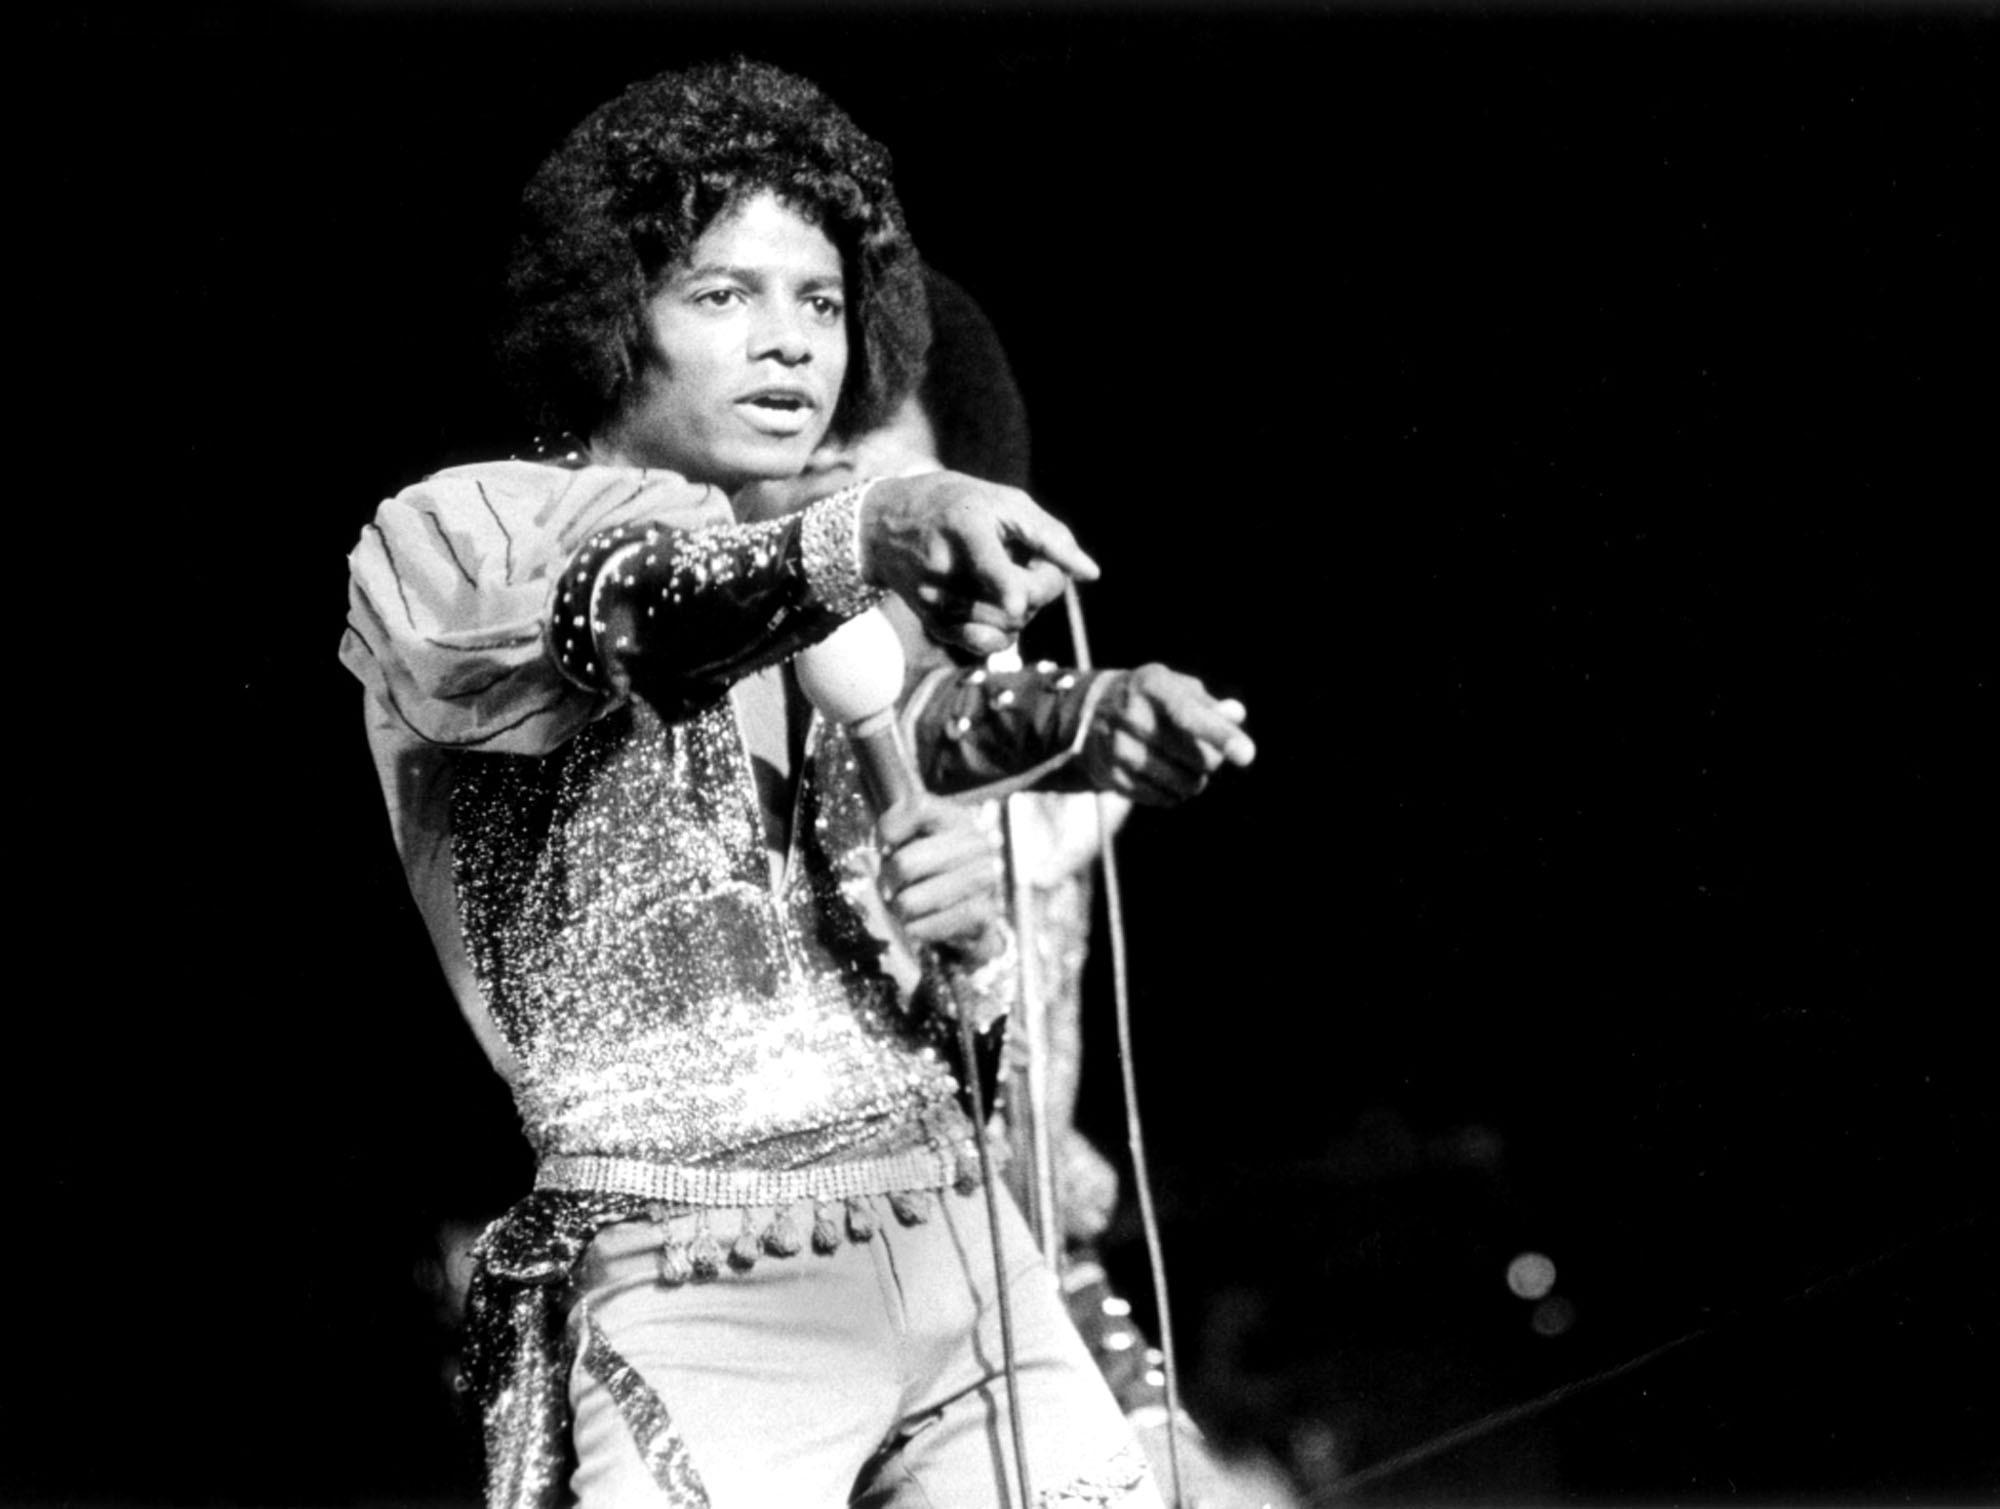 The Jacksons Triumph